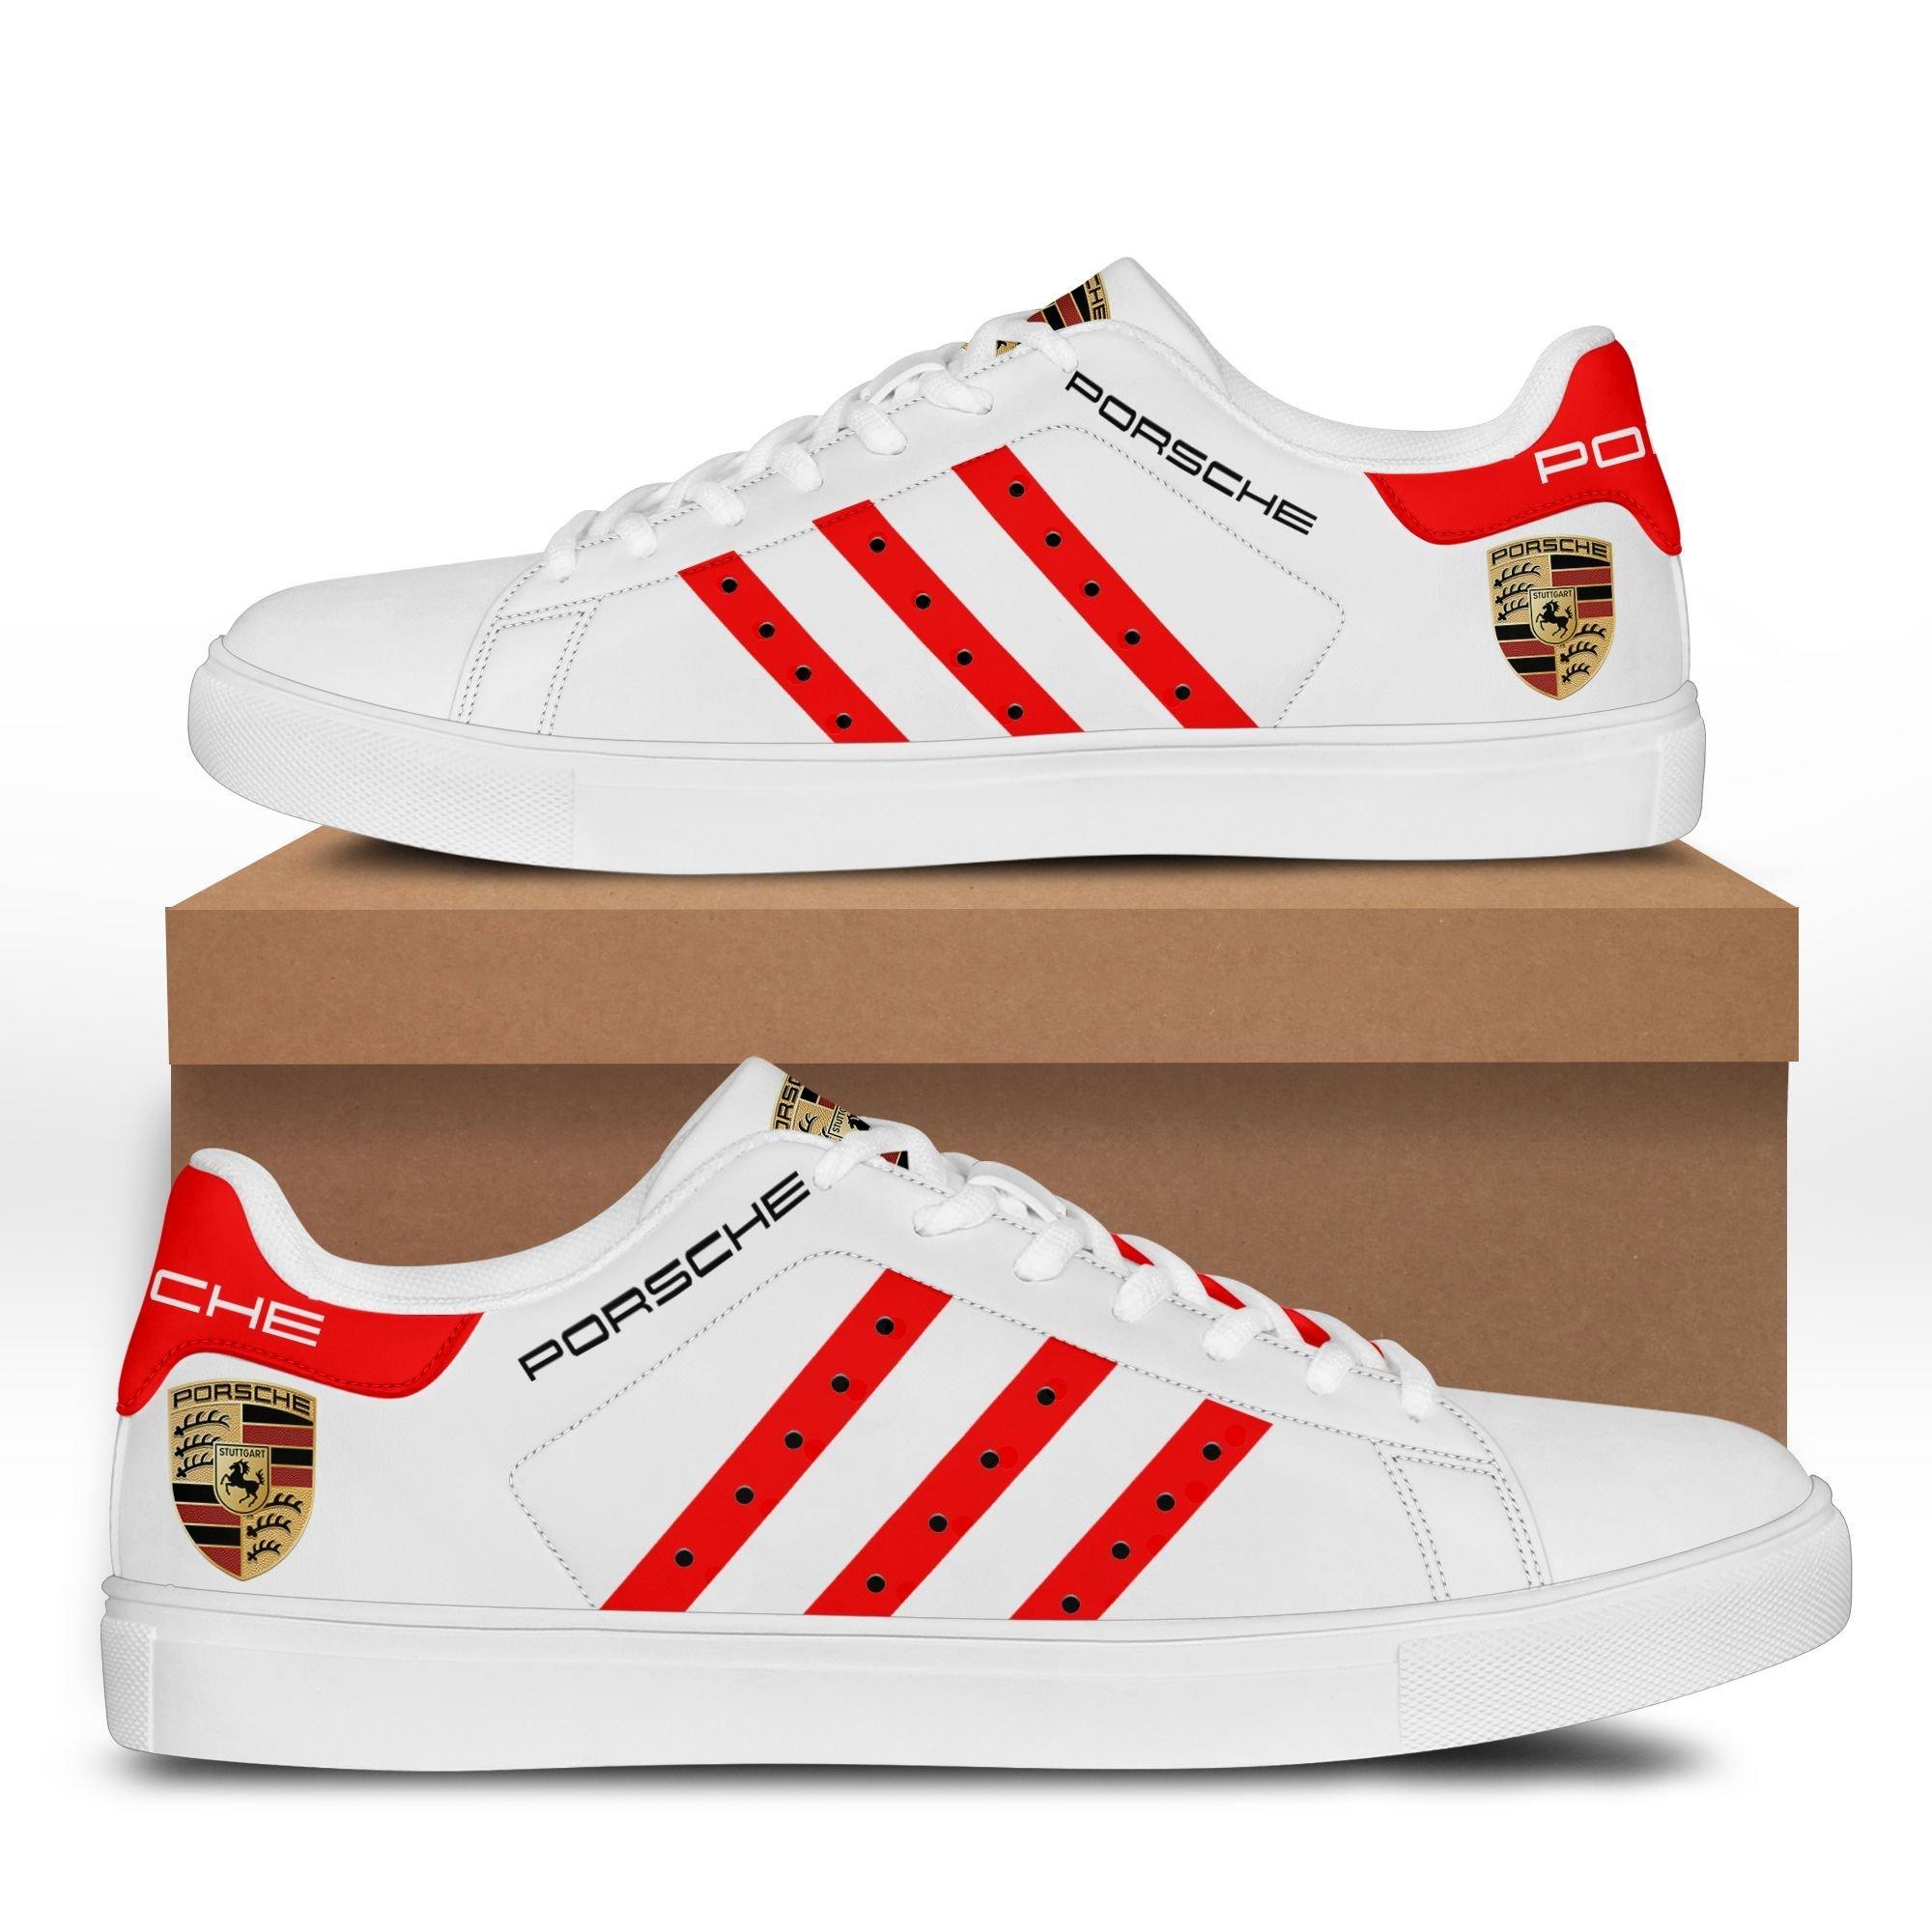 PORSCHE logo 911 red line white Stan Smith Shoes